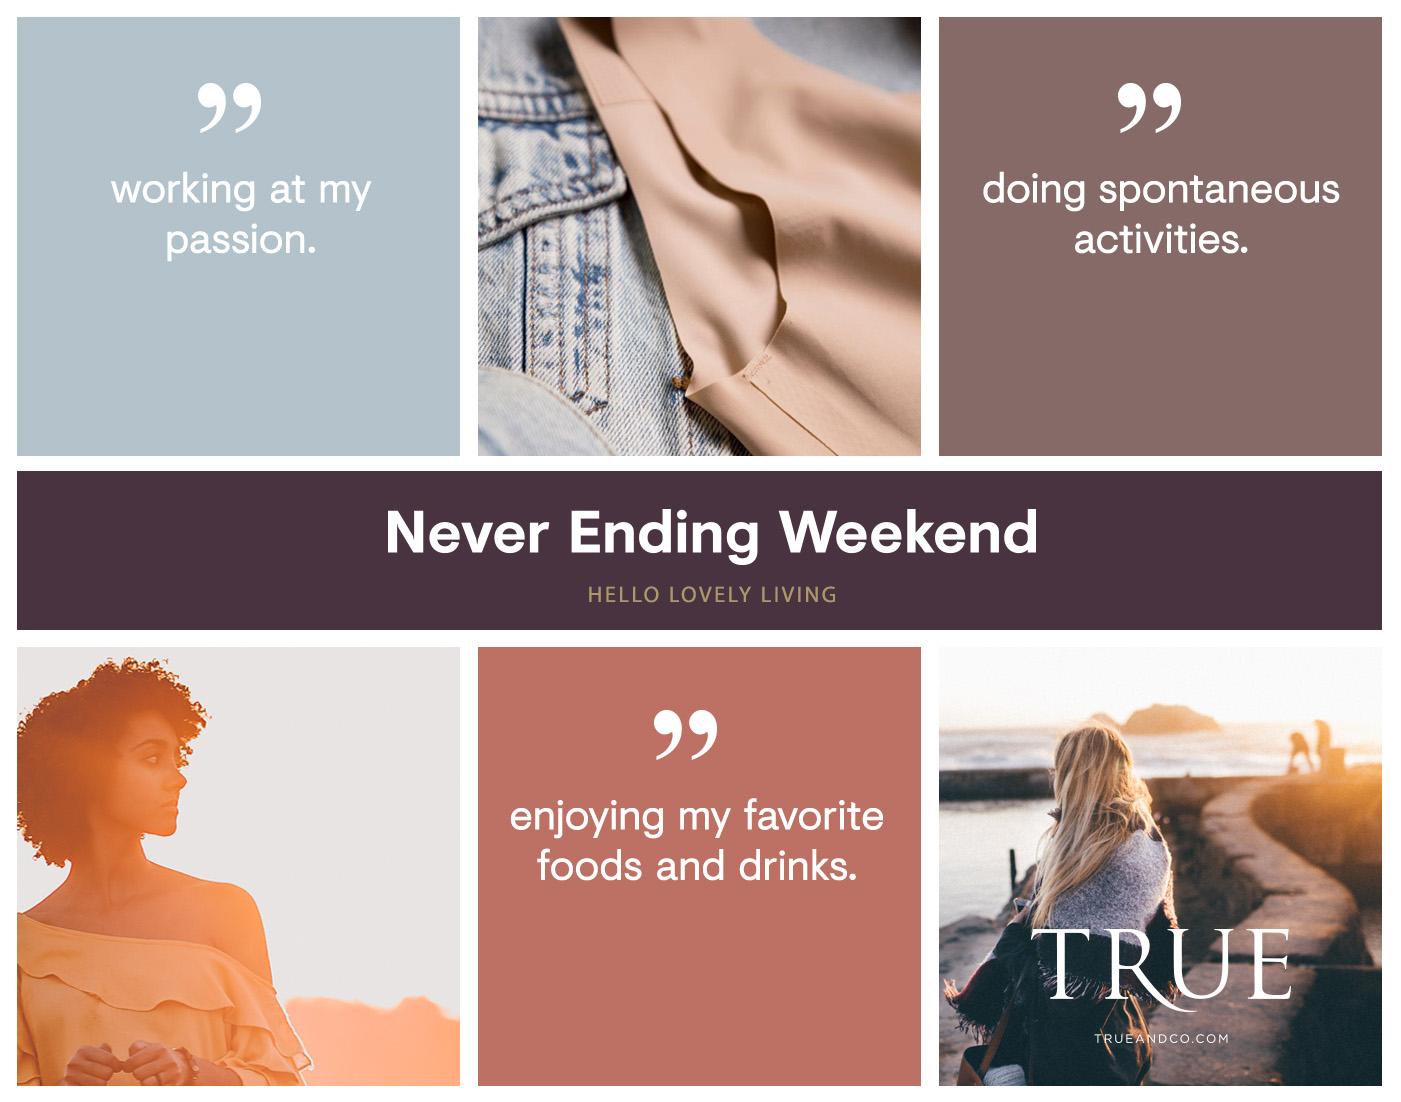 hellolovelyliving.com | The Never-Ending Weekend